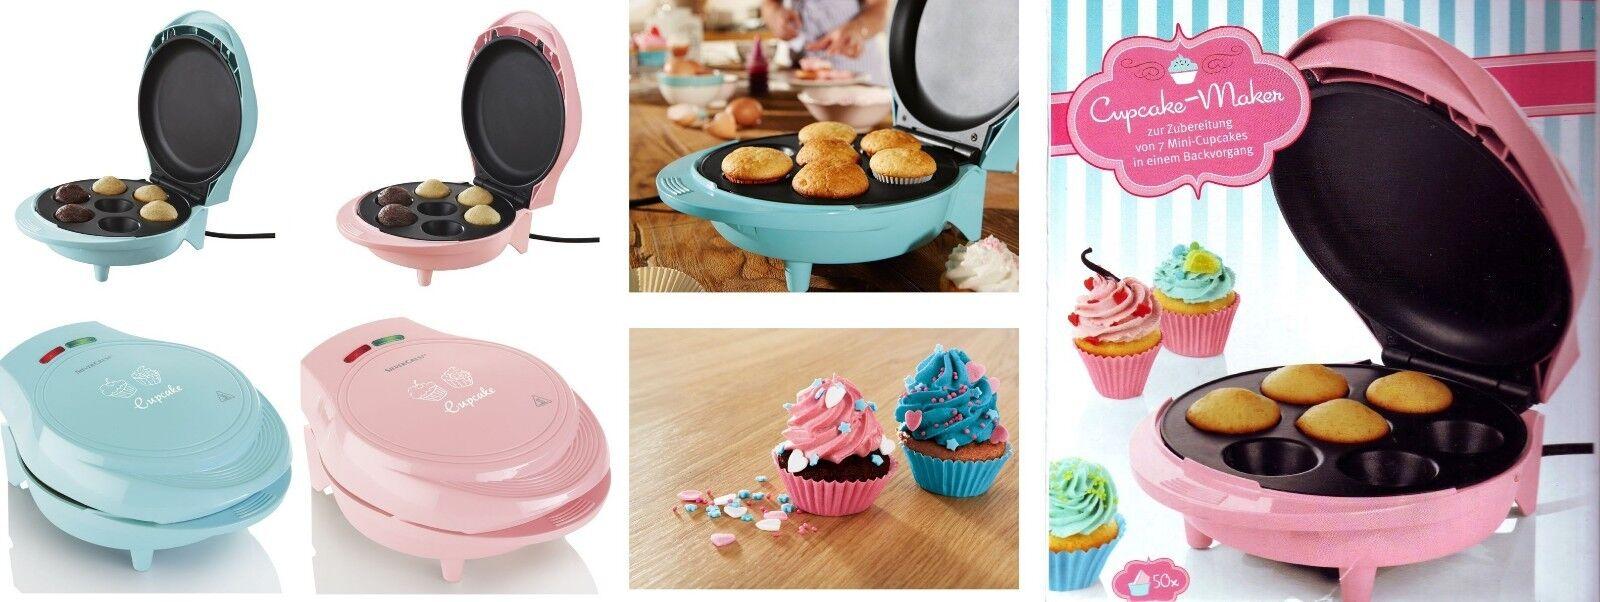 Muffin / Cake / Cupcake-Maker SilverCrest SCCM 800 inkl. 50 Förmchen.  NEU & OVP